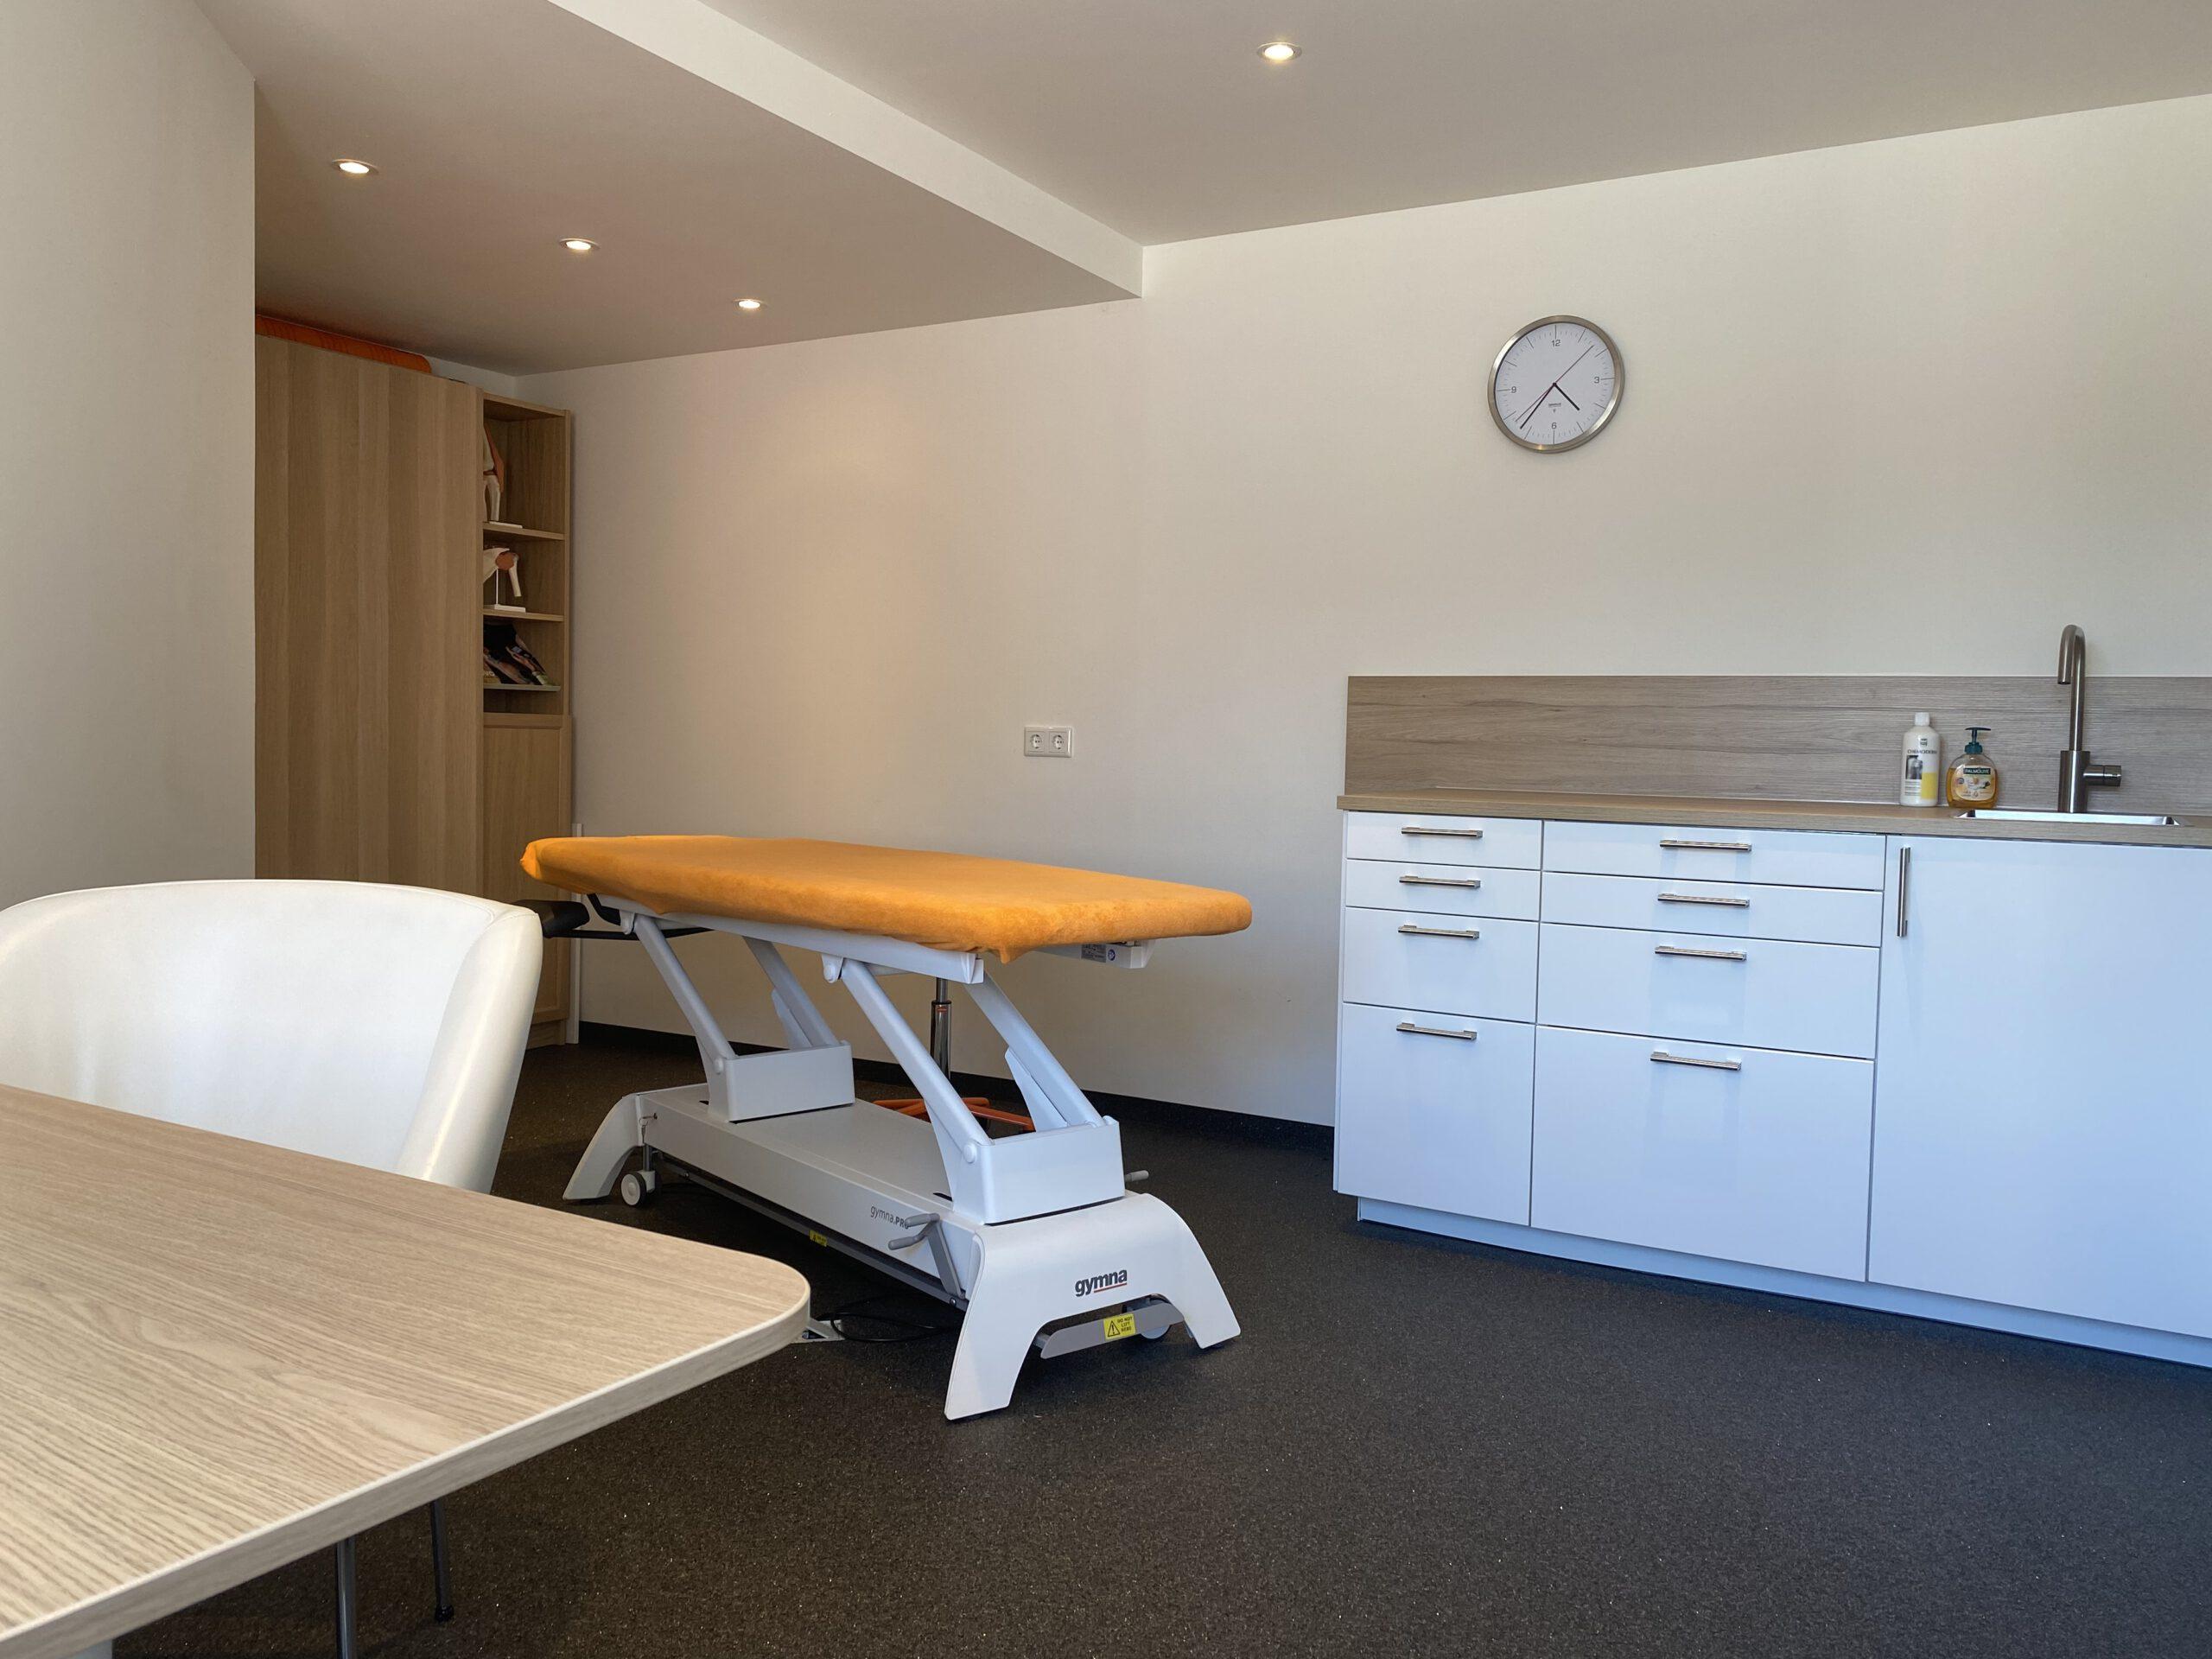 SportFysiotherapie van Lierop Praktijkruimte locatie Driel